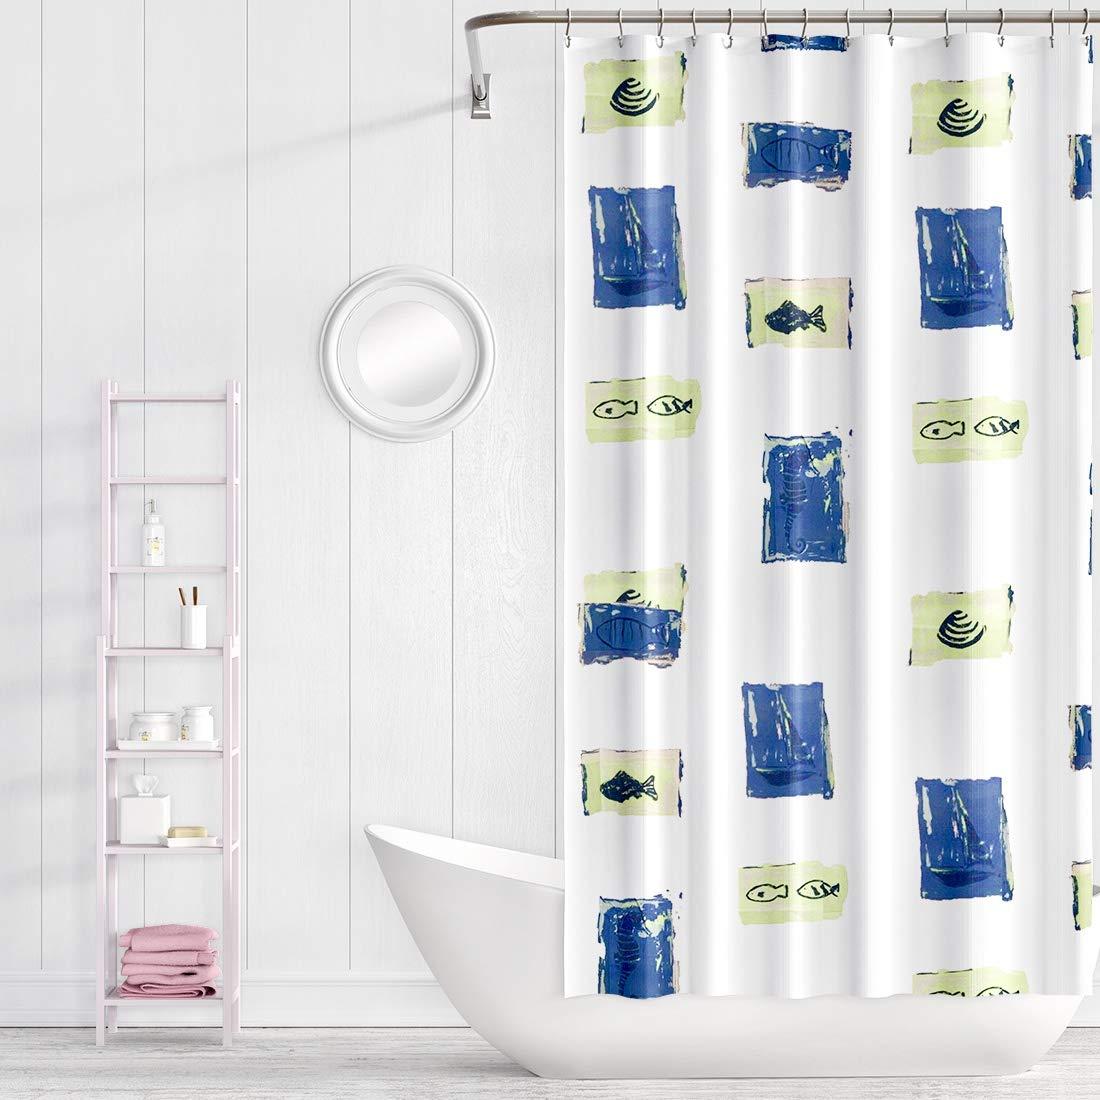 Under Ten Shower Curtain Decorative Hooks Bath Set (Treated to Resist Deterioration Mildew) - 72 x 70 inches (Blue)